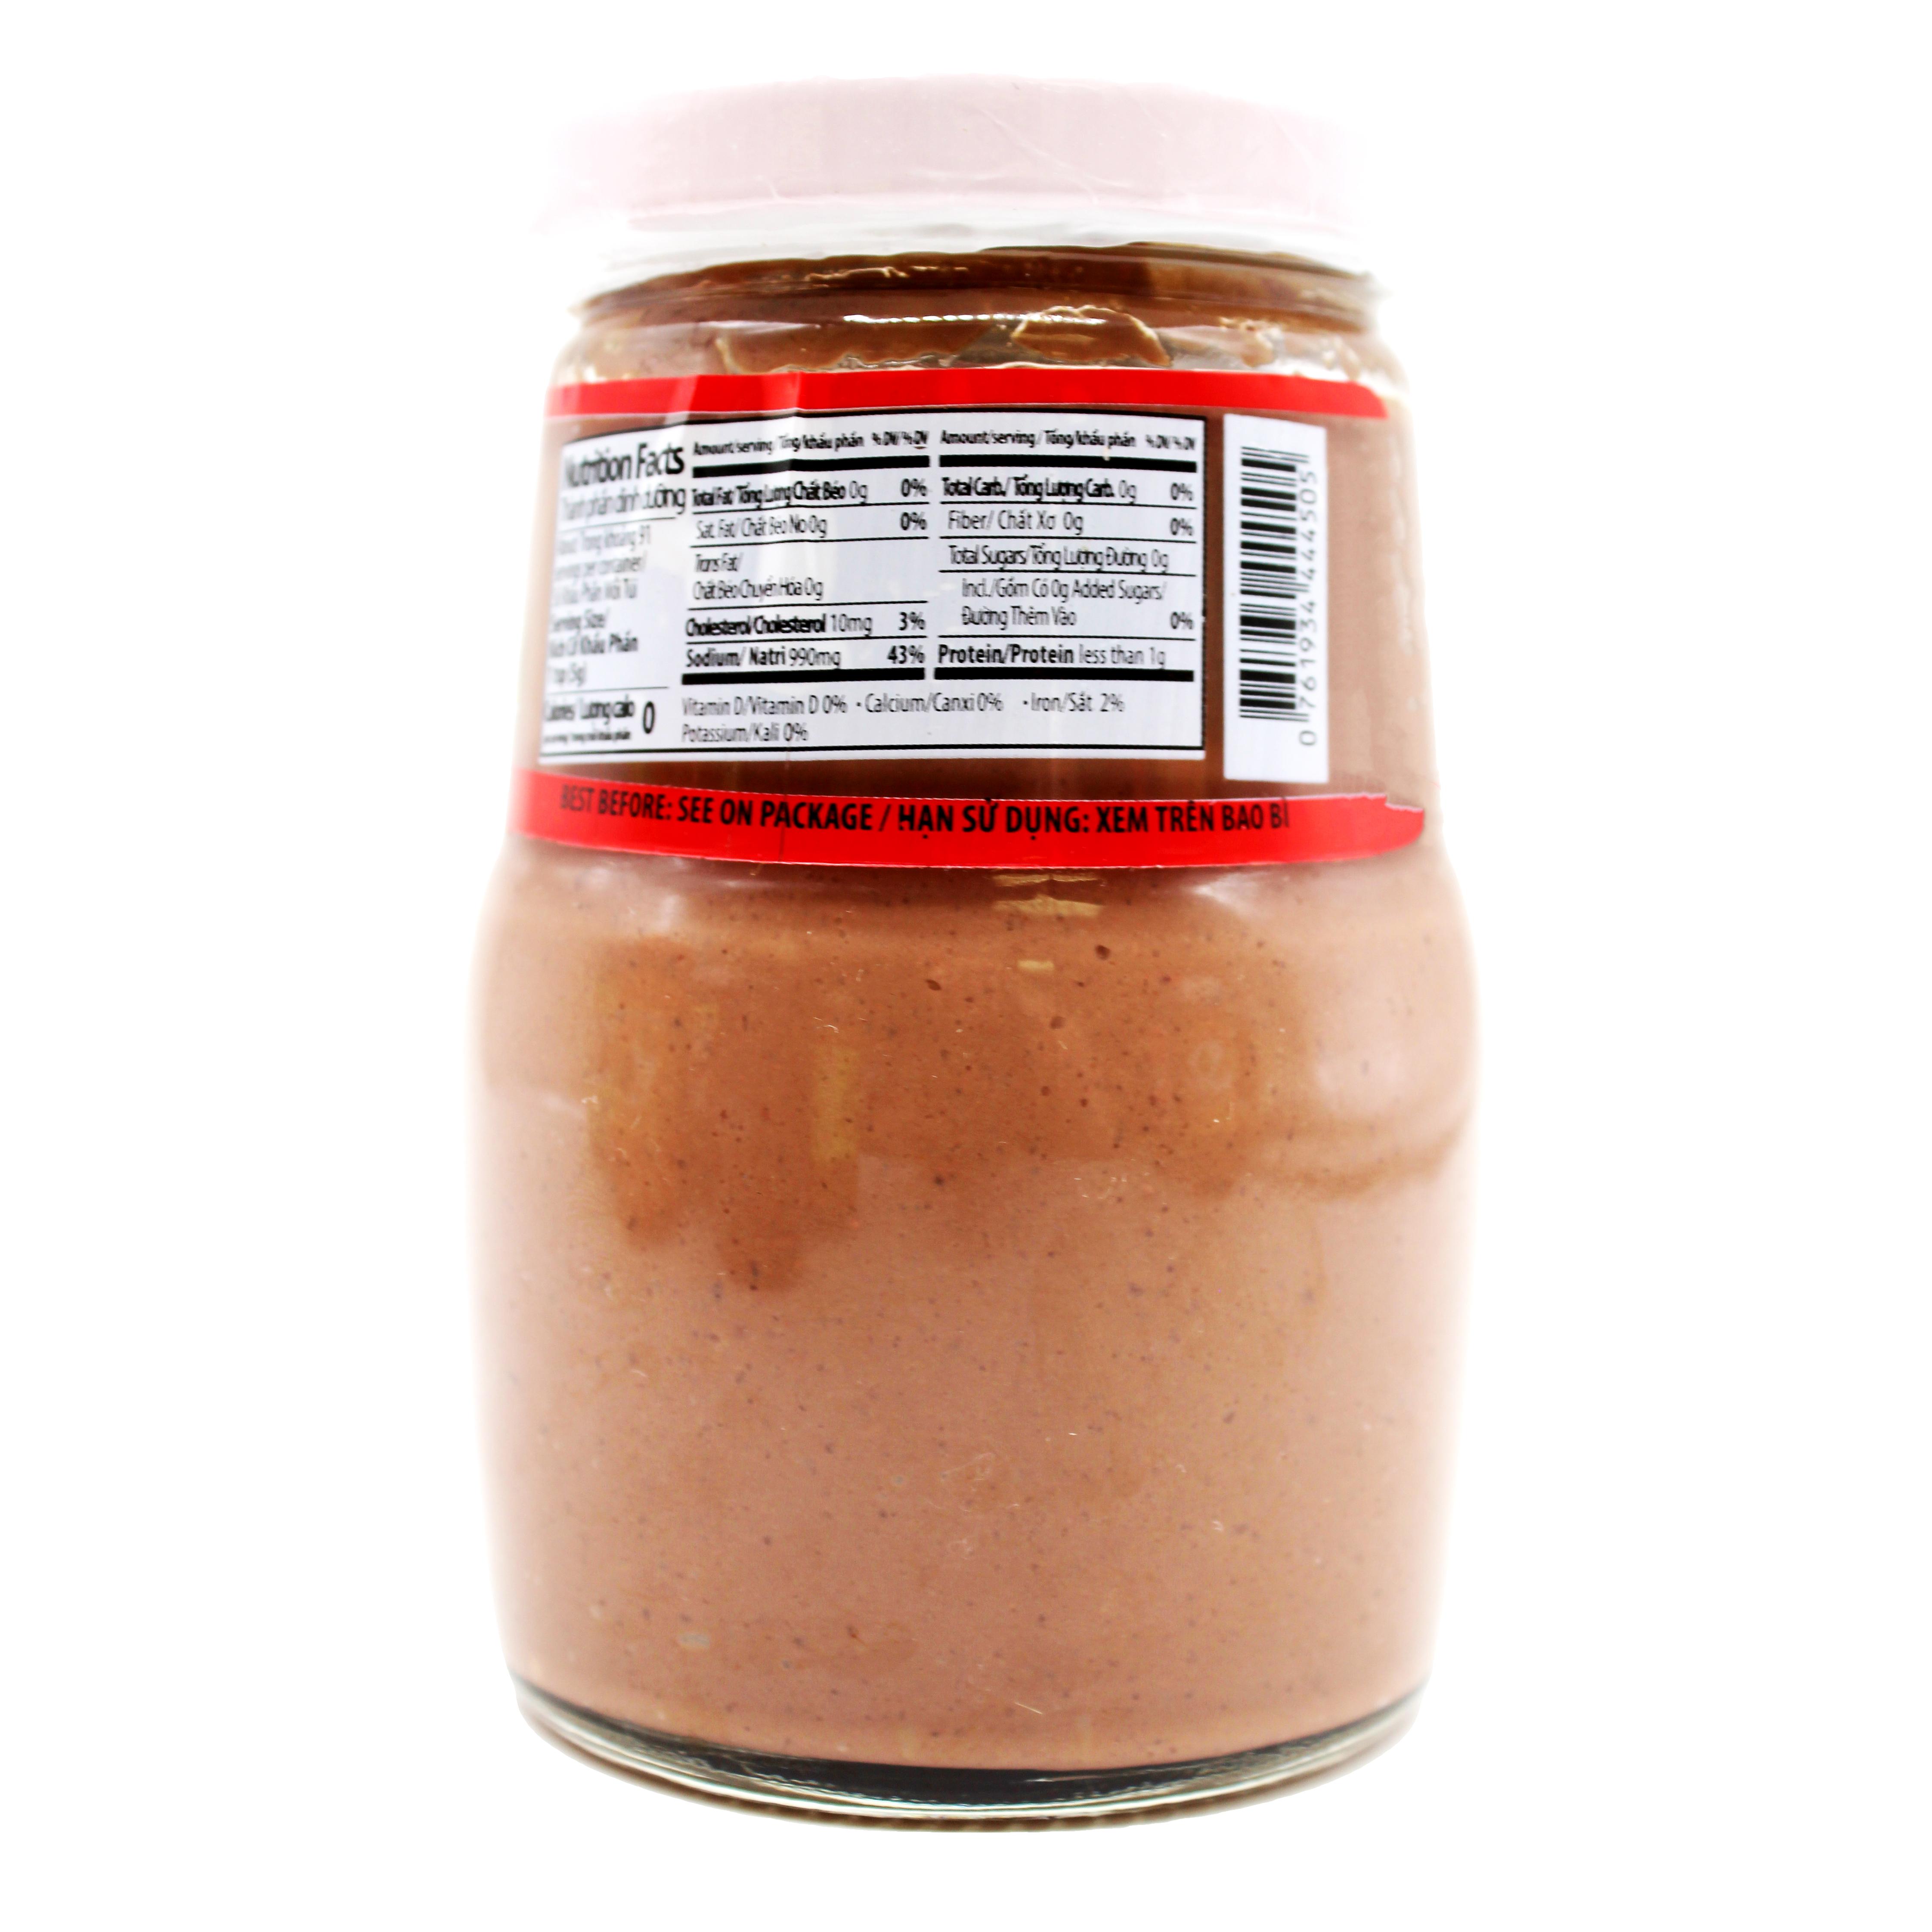 medium sunlee shrimp sauce mam ruoc cha hue 141 oz dud8e6yYQ